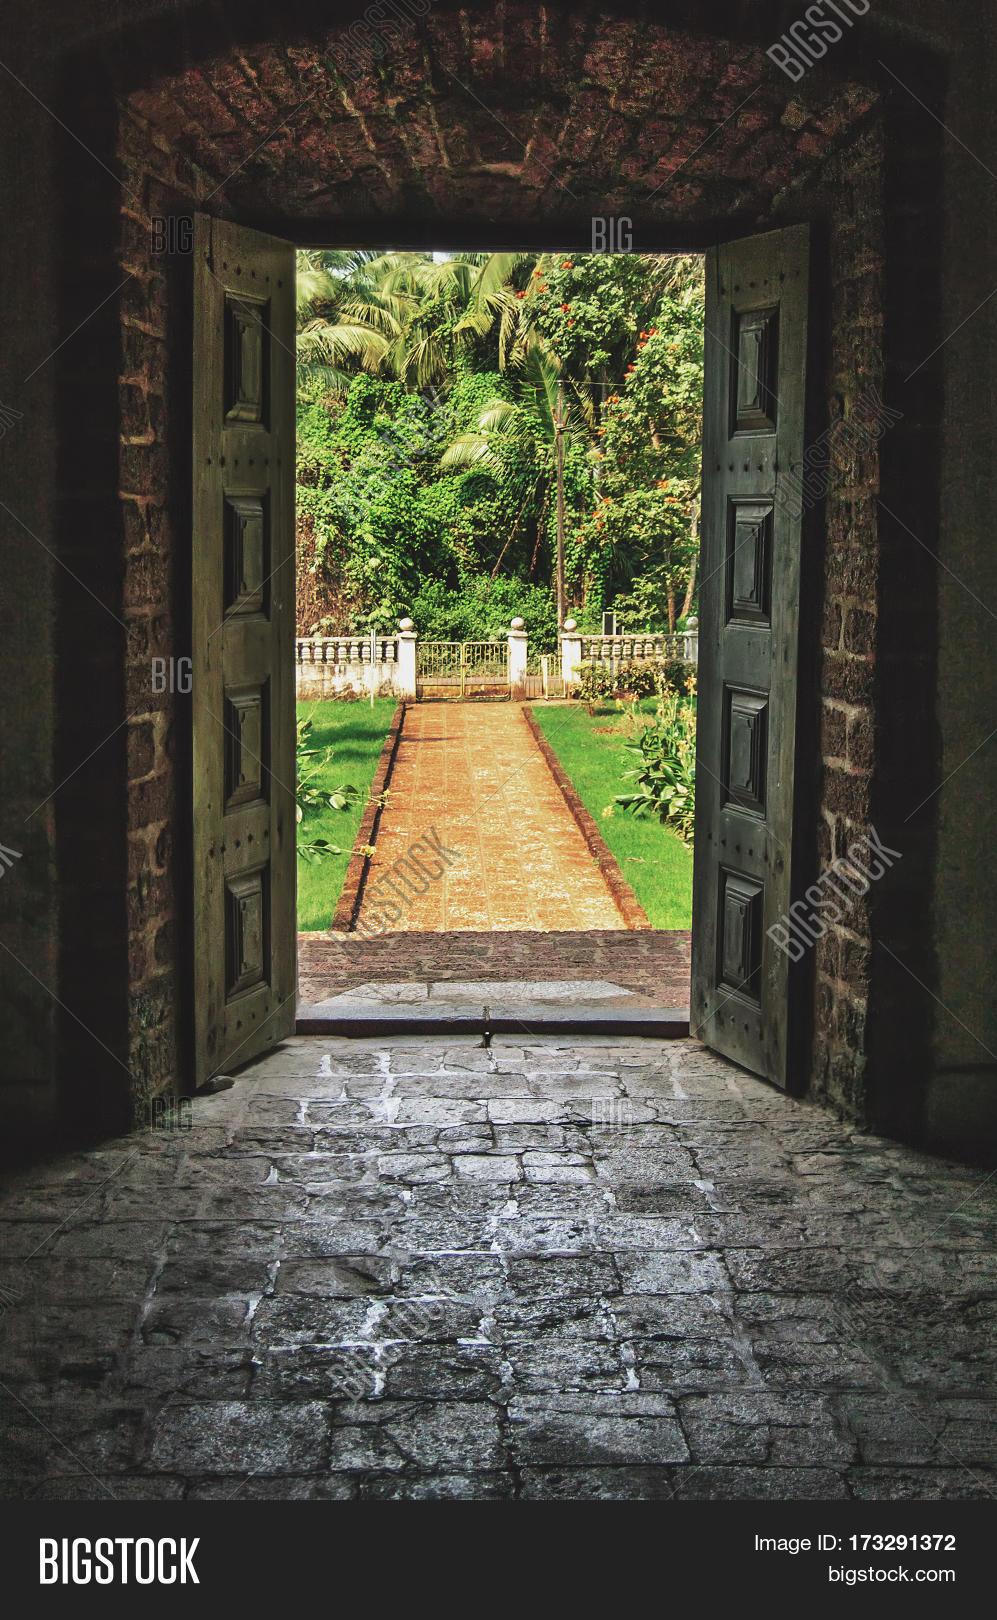 Open Doors Tropical Image Amp Photo Free Trial Bigstock